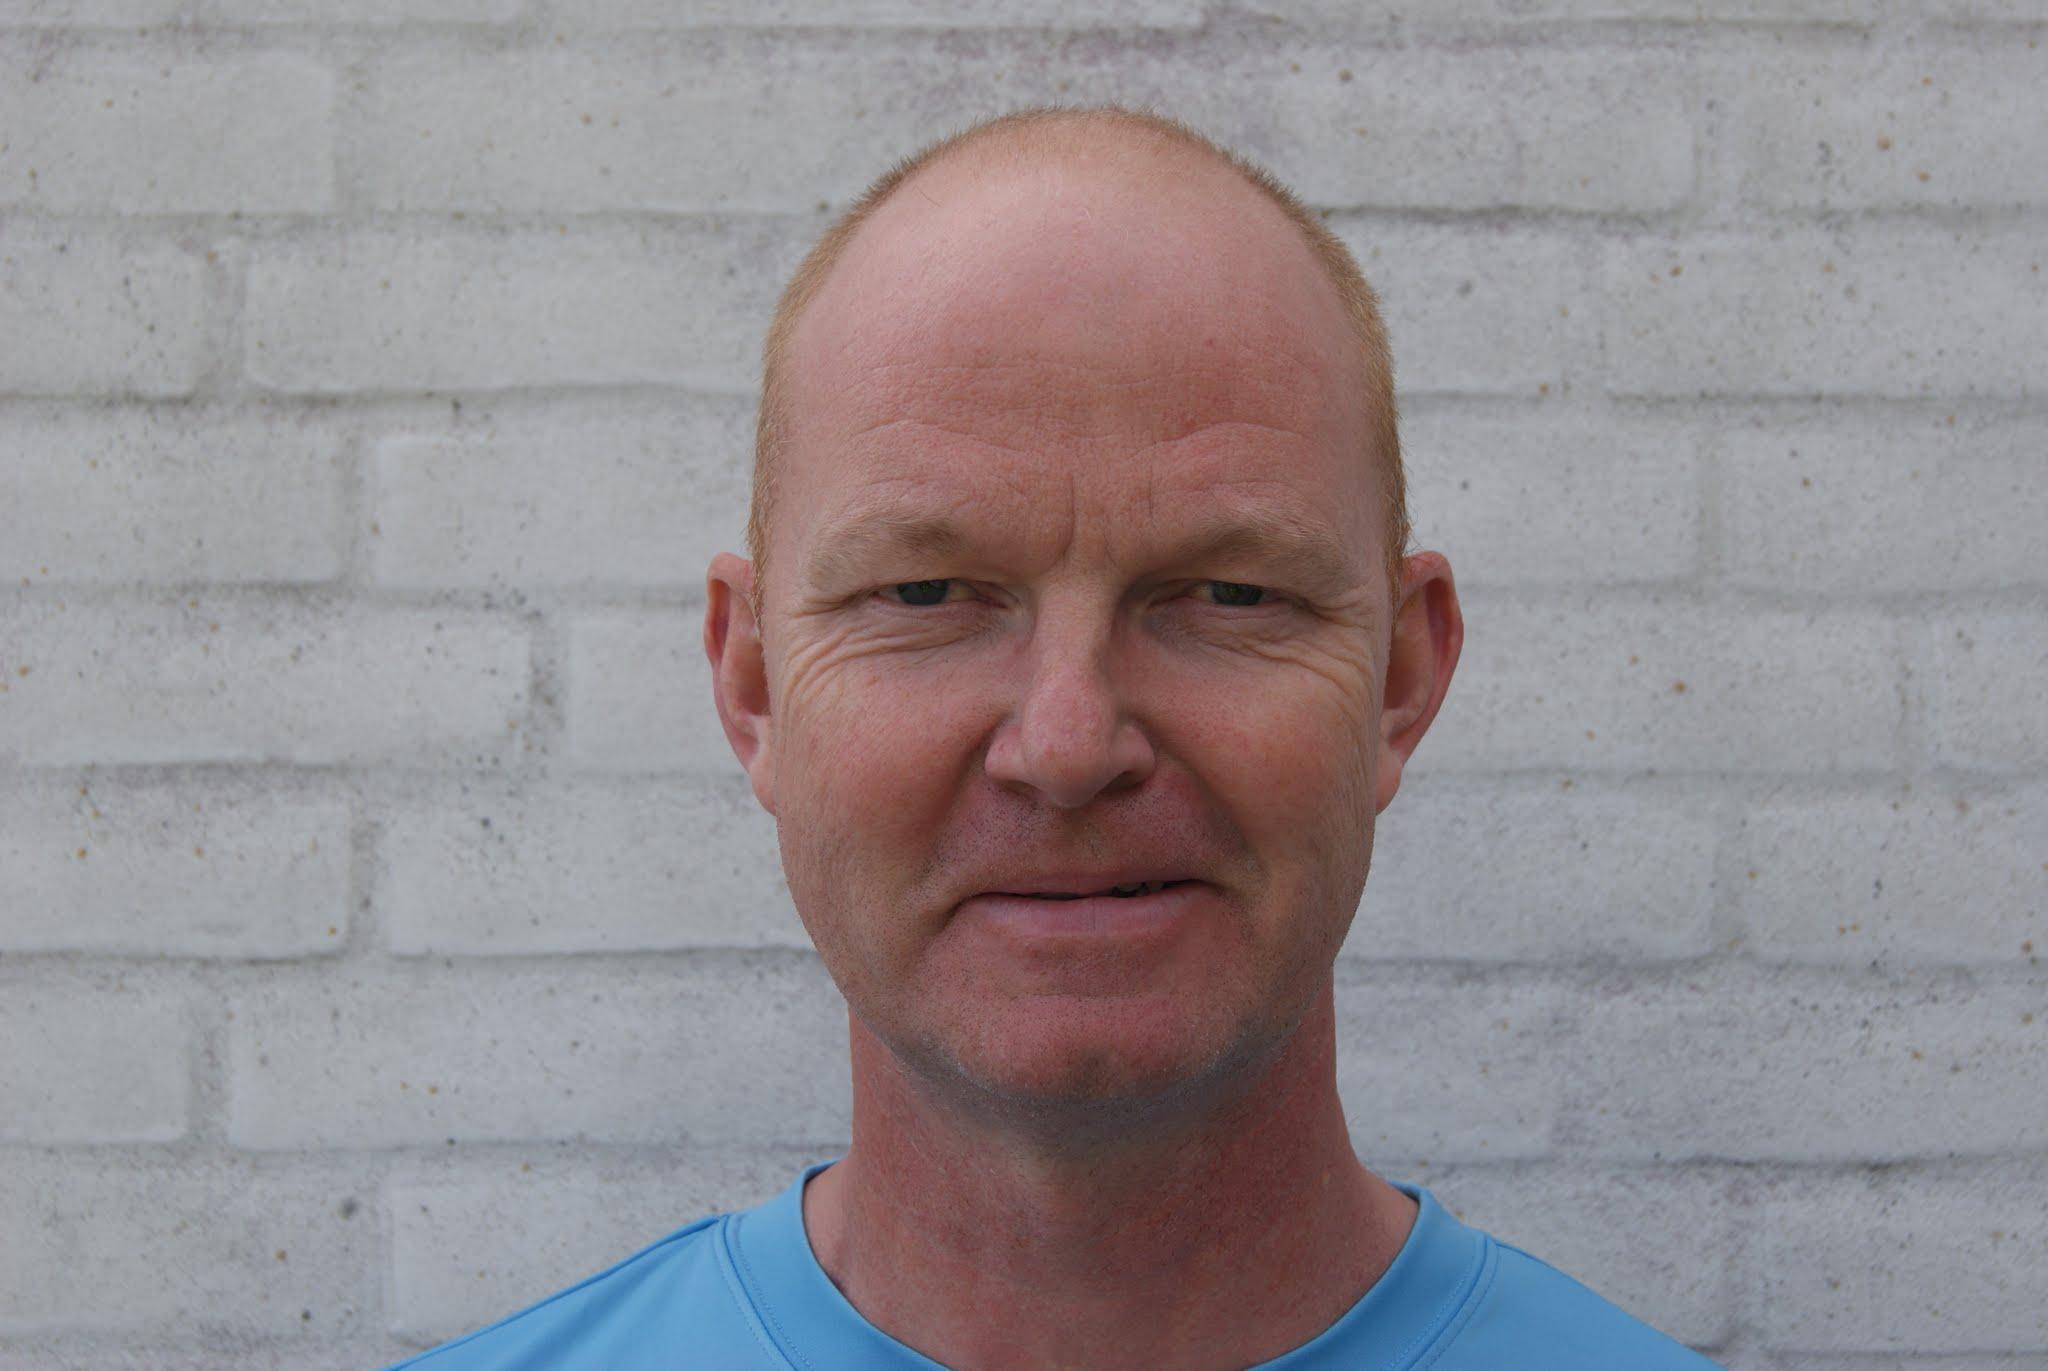 Frank Stokholm